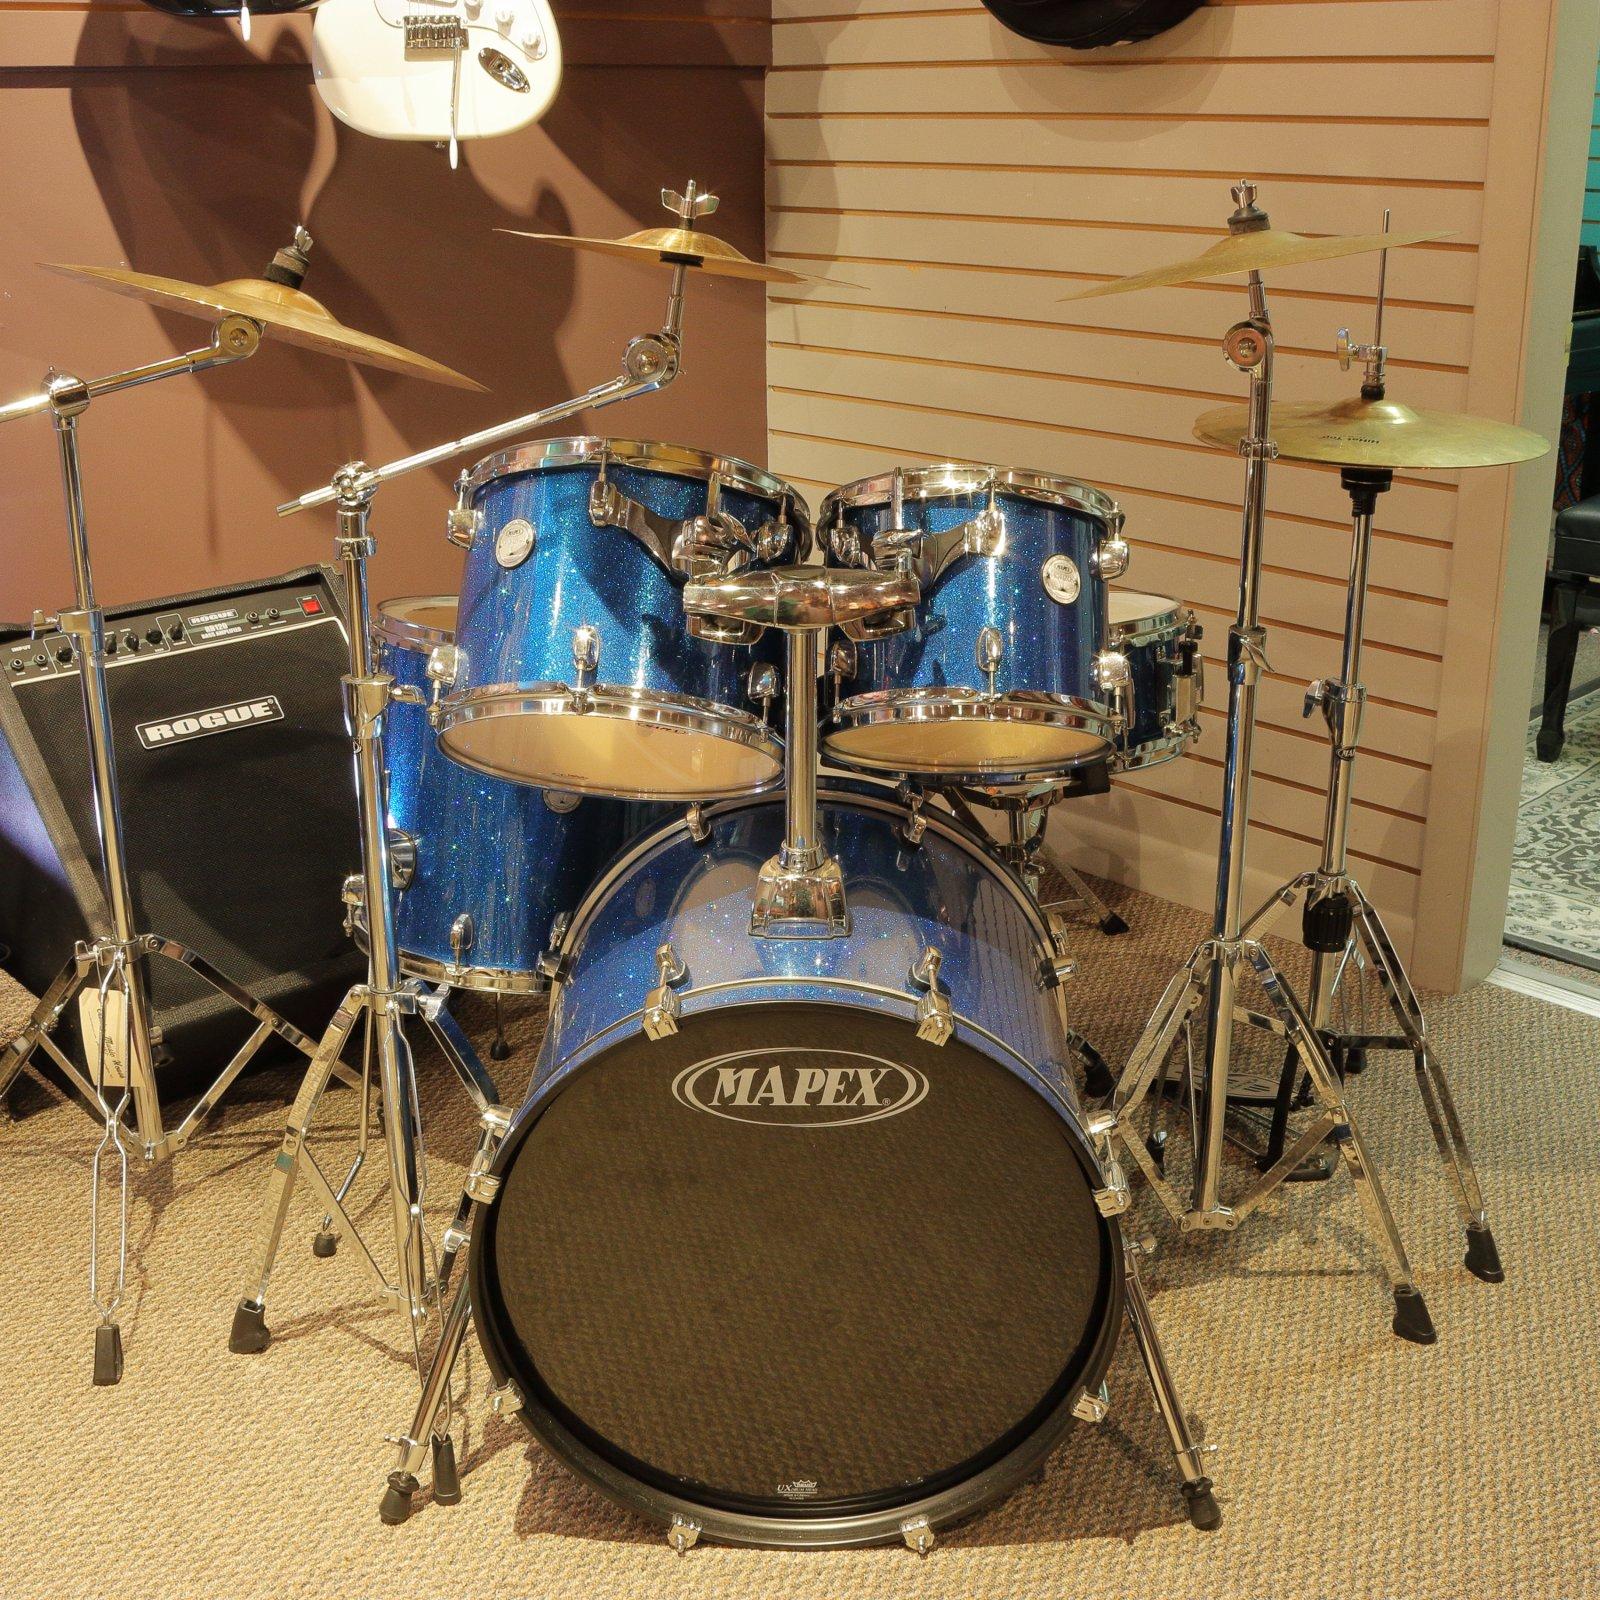 Mapex Horizon HX Series HX5045TCZNS 5-Piece Drum Set, Blue Sparkle, w/ Hardware & Cymbals (USED)